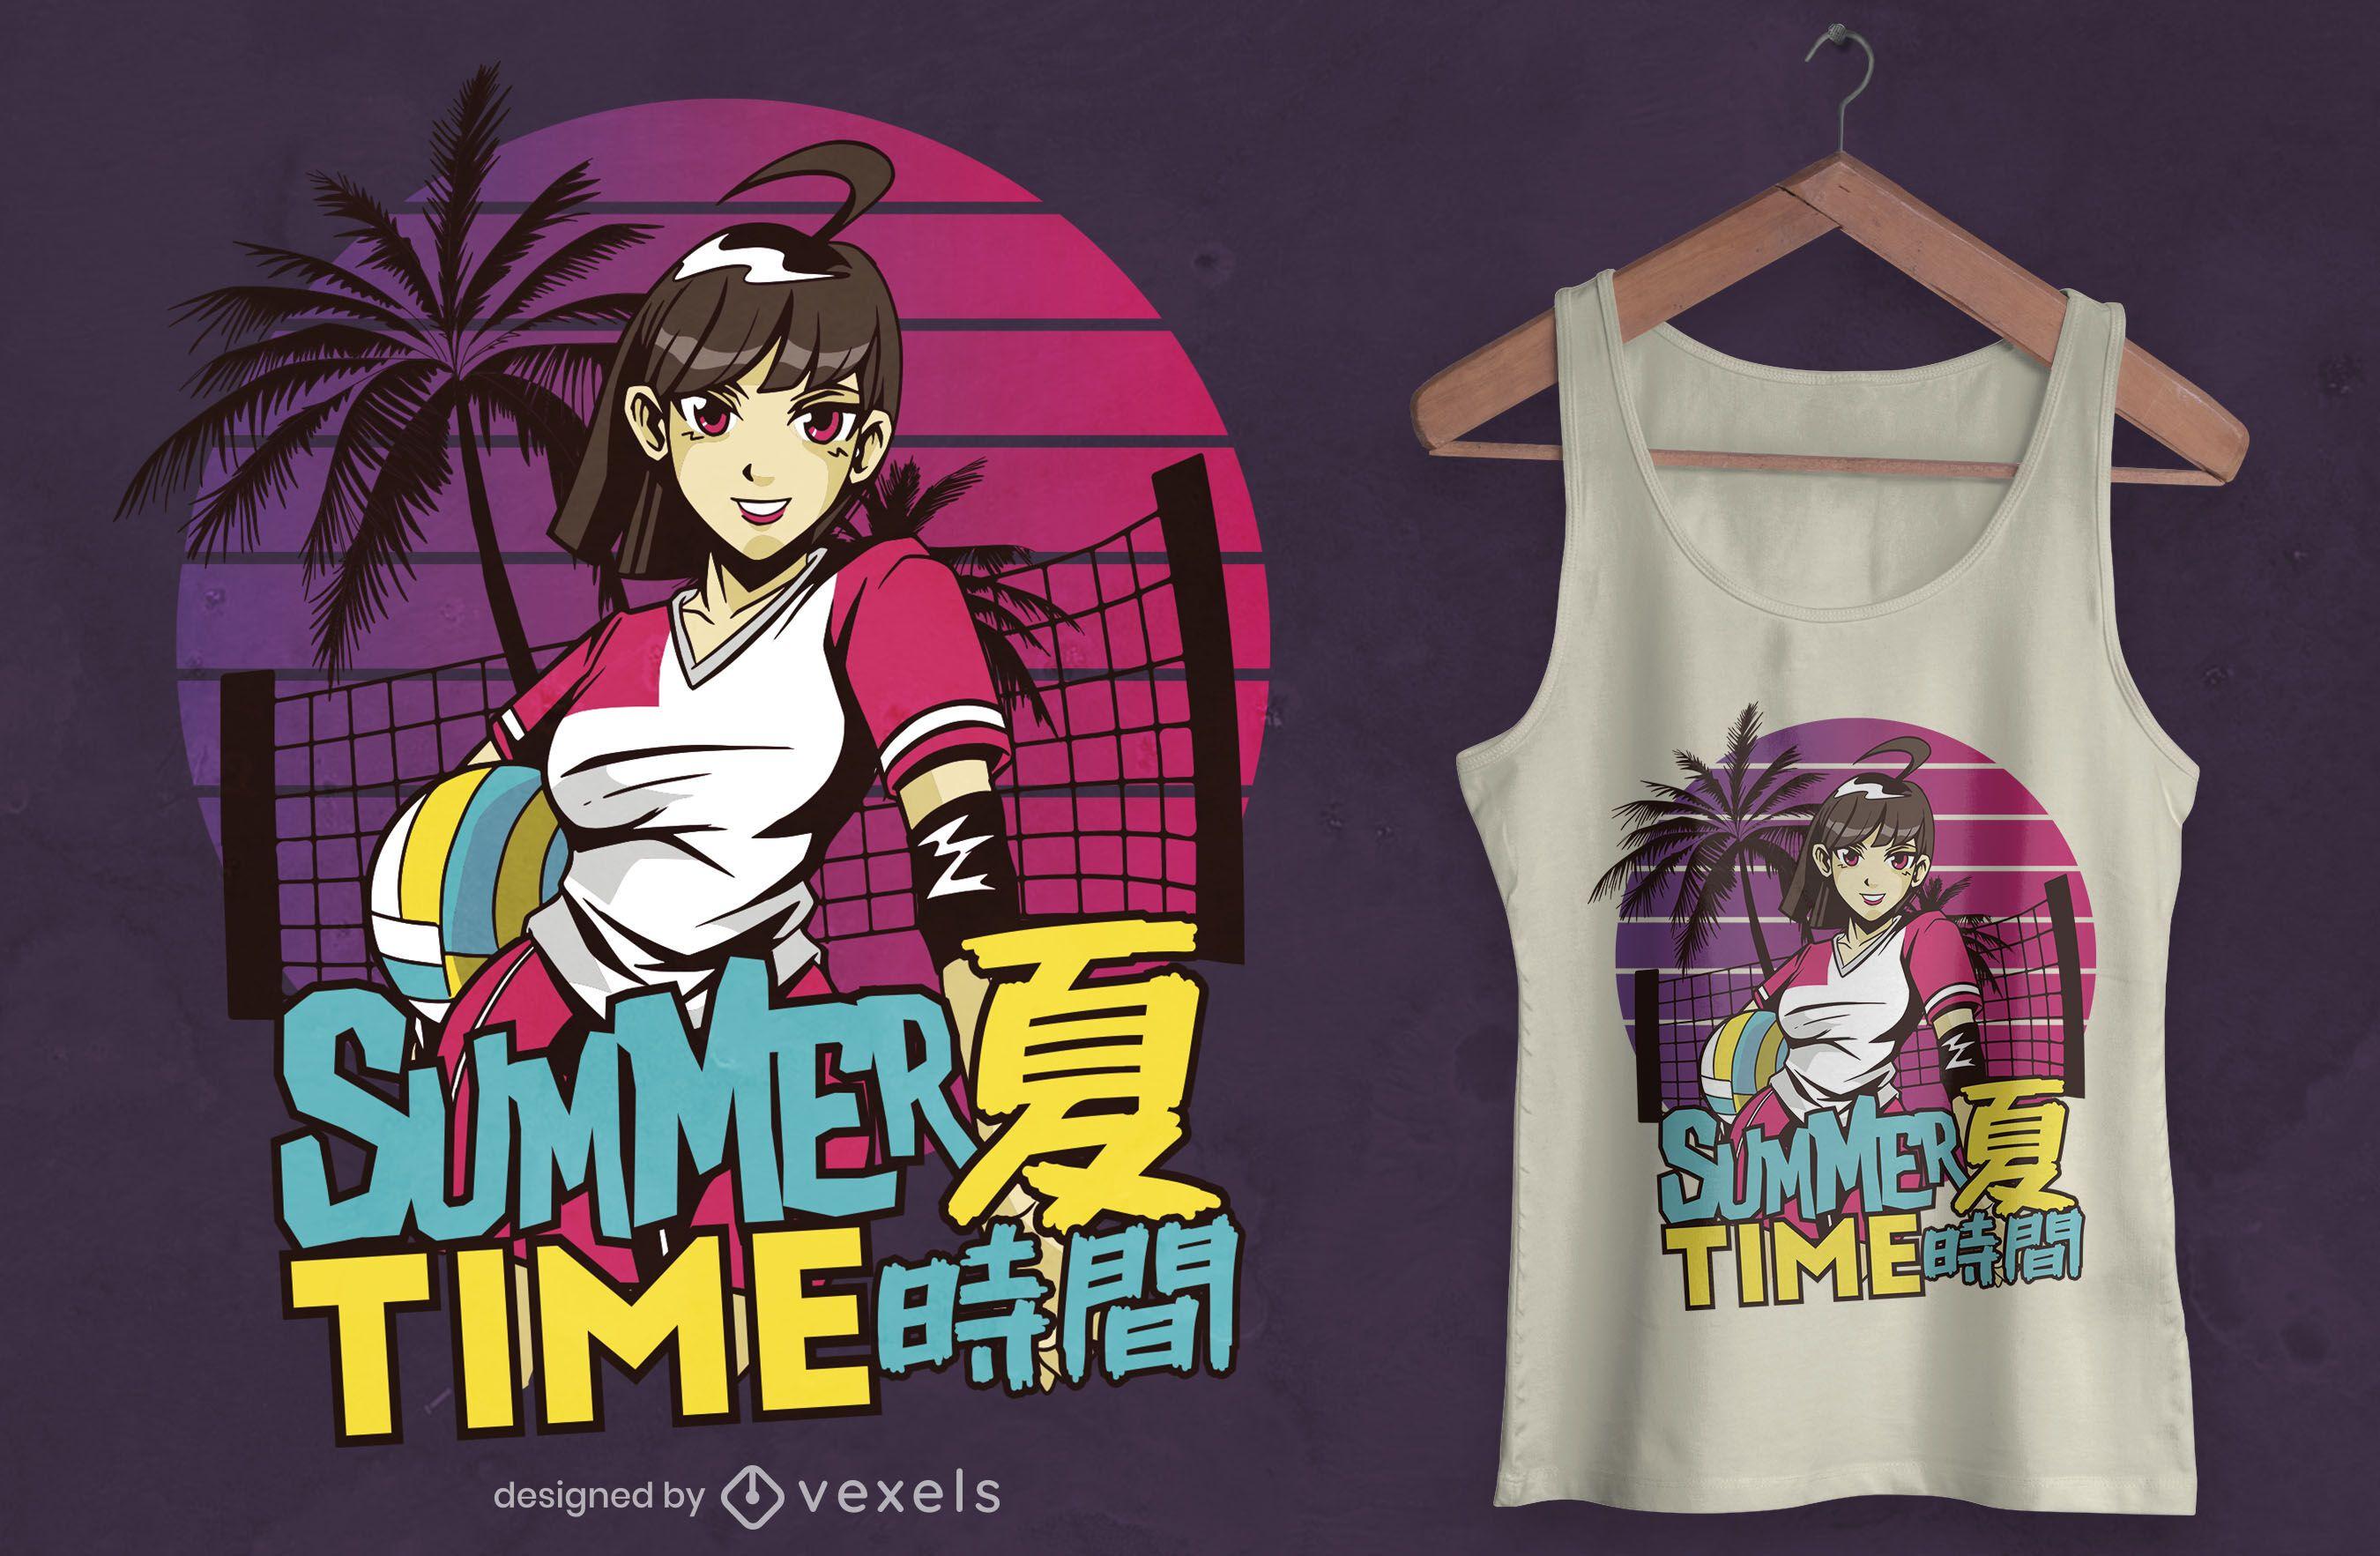 Summer time anime t-shirt design